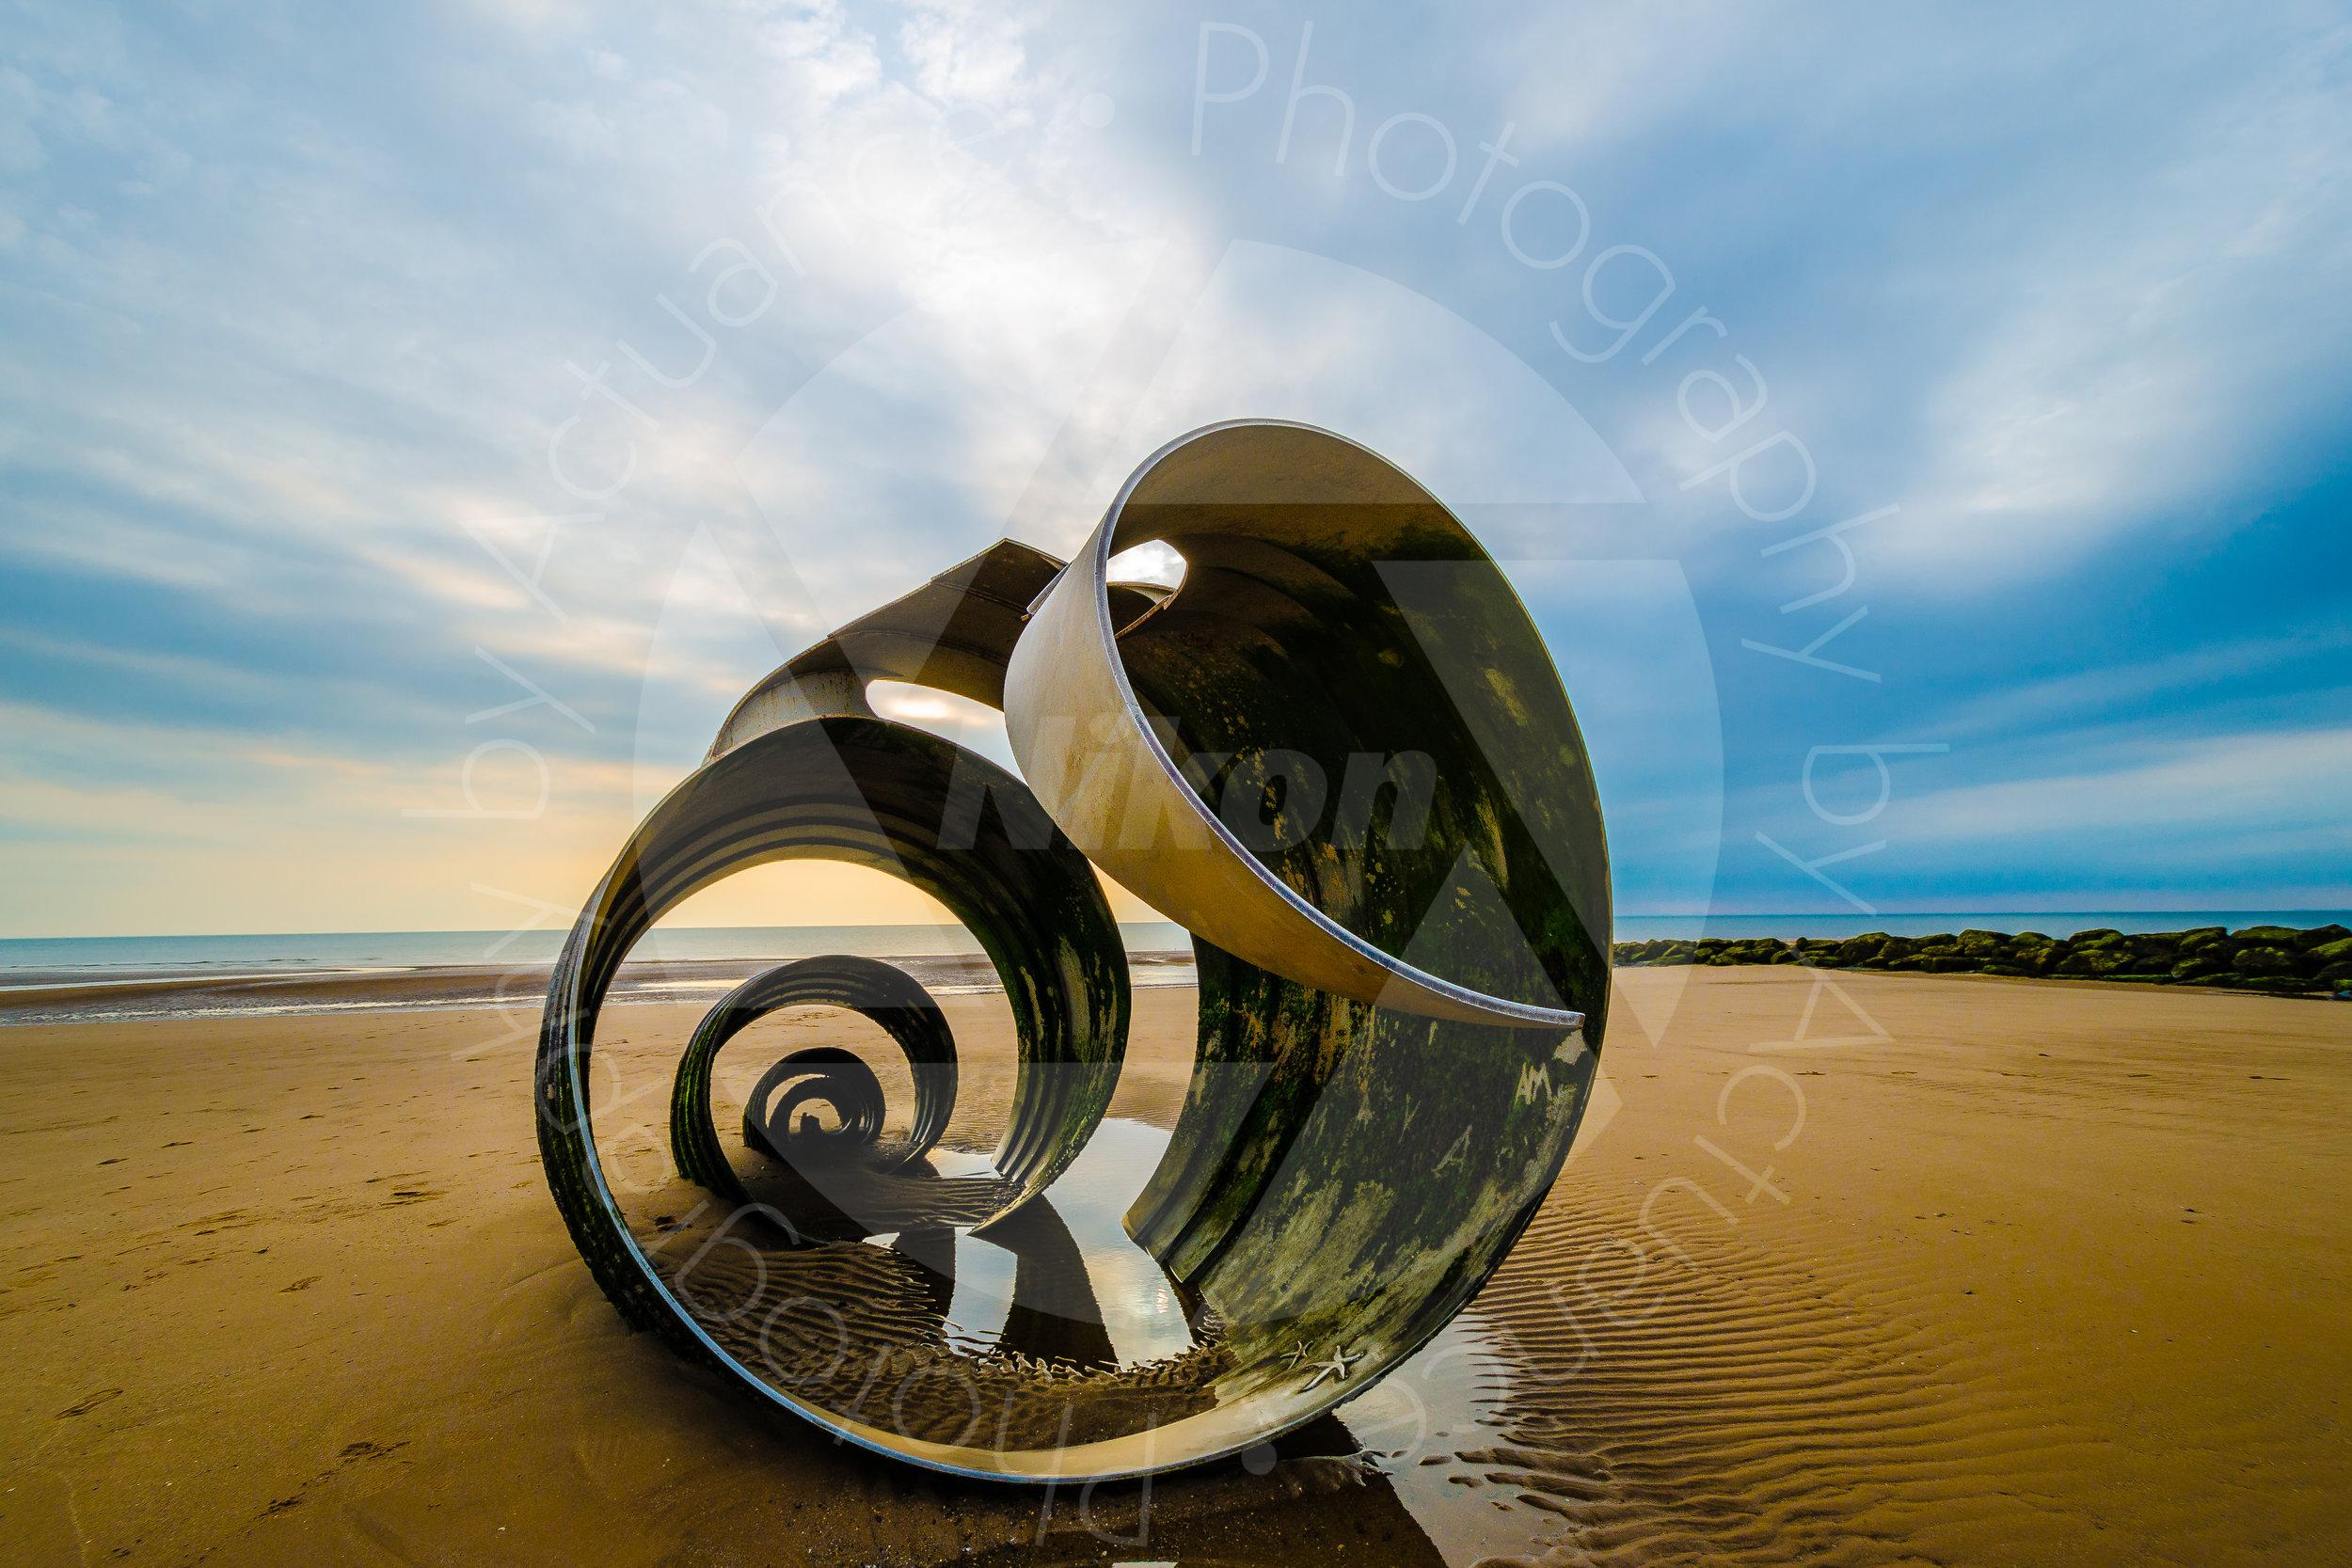 20180604 Marys Shell-4.JPG